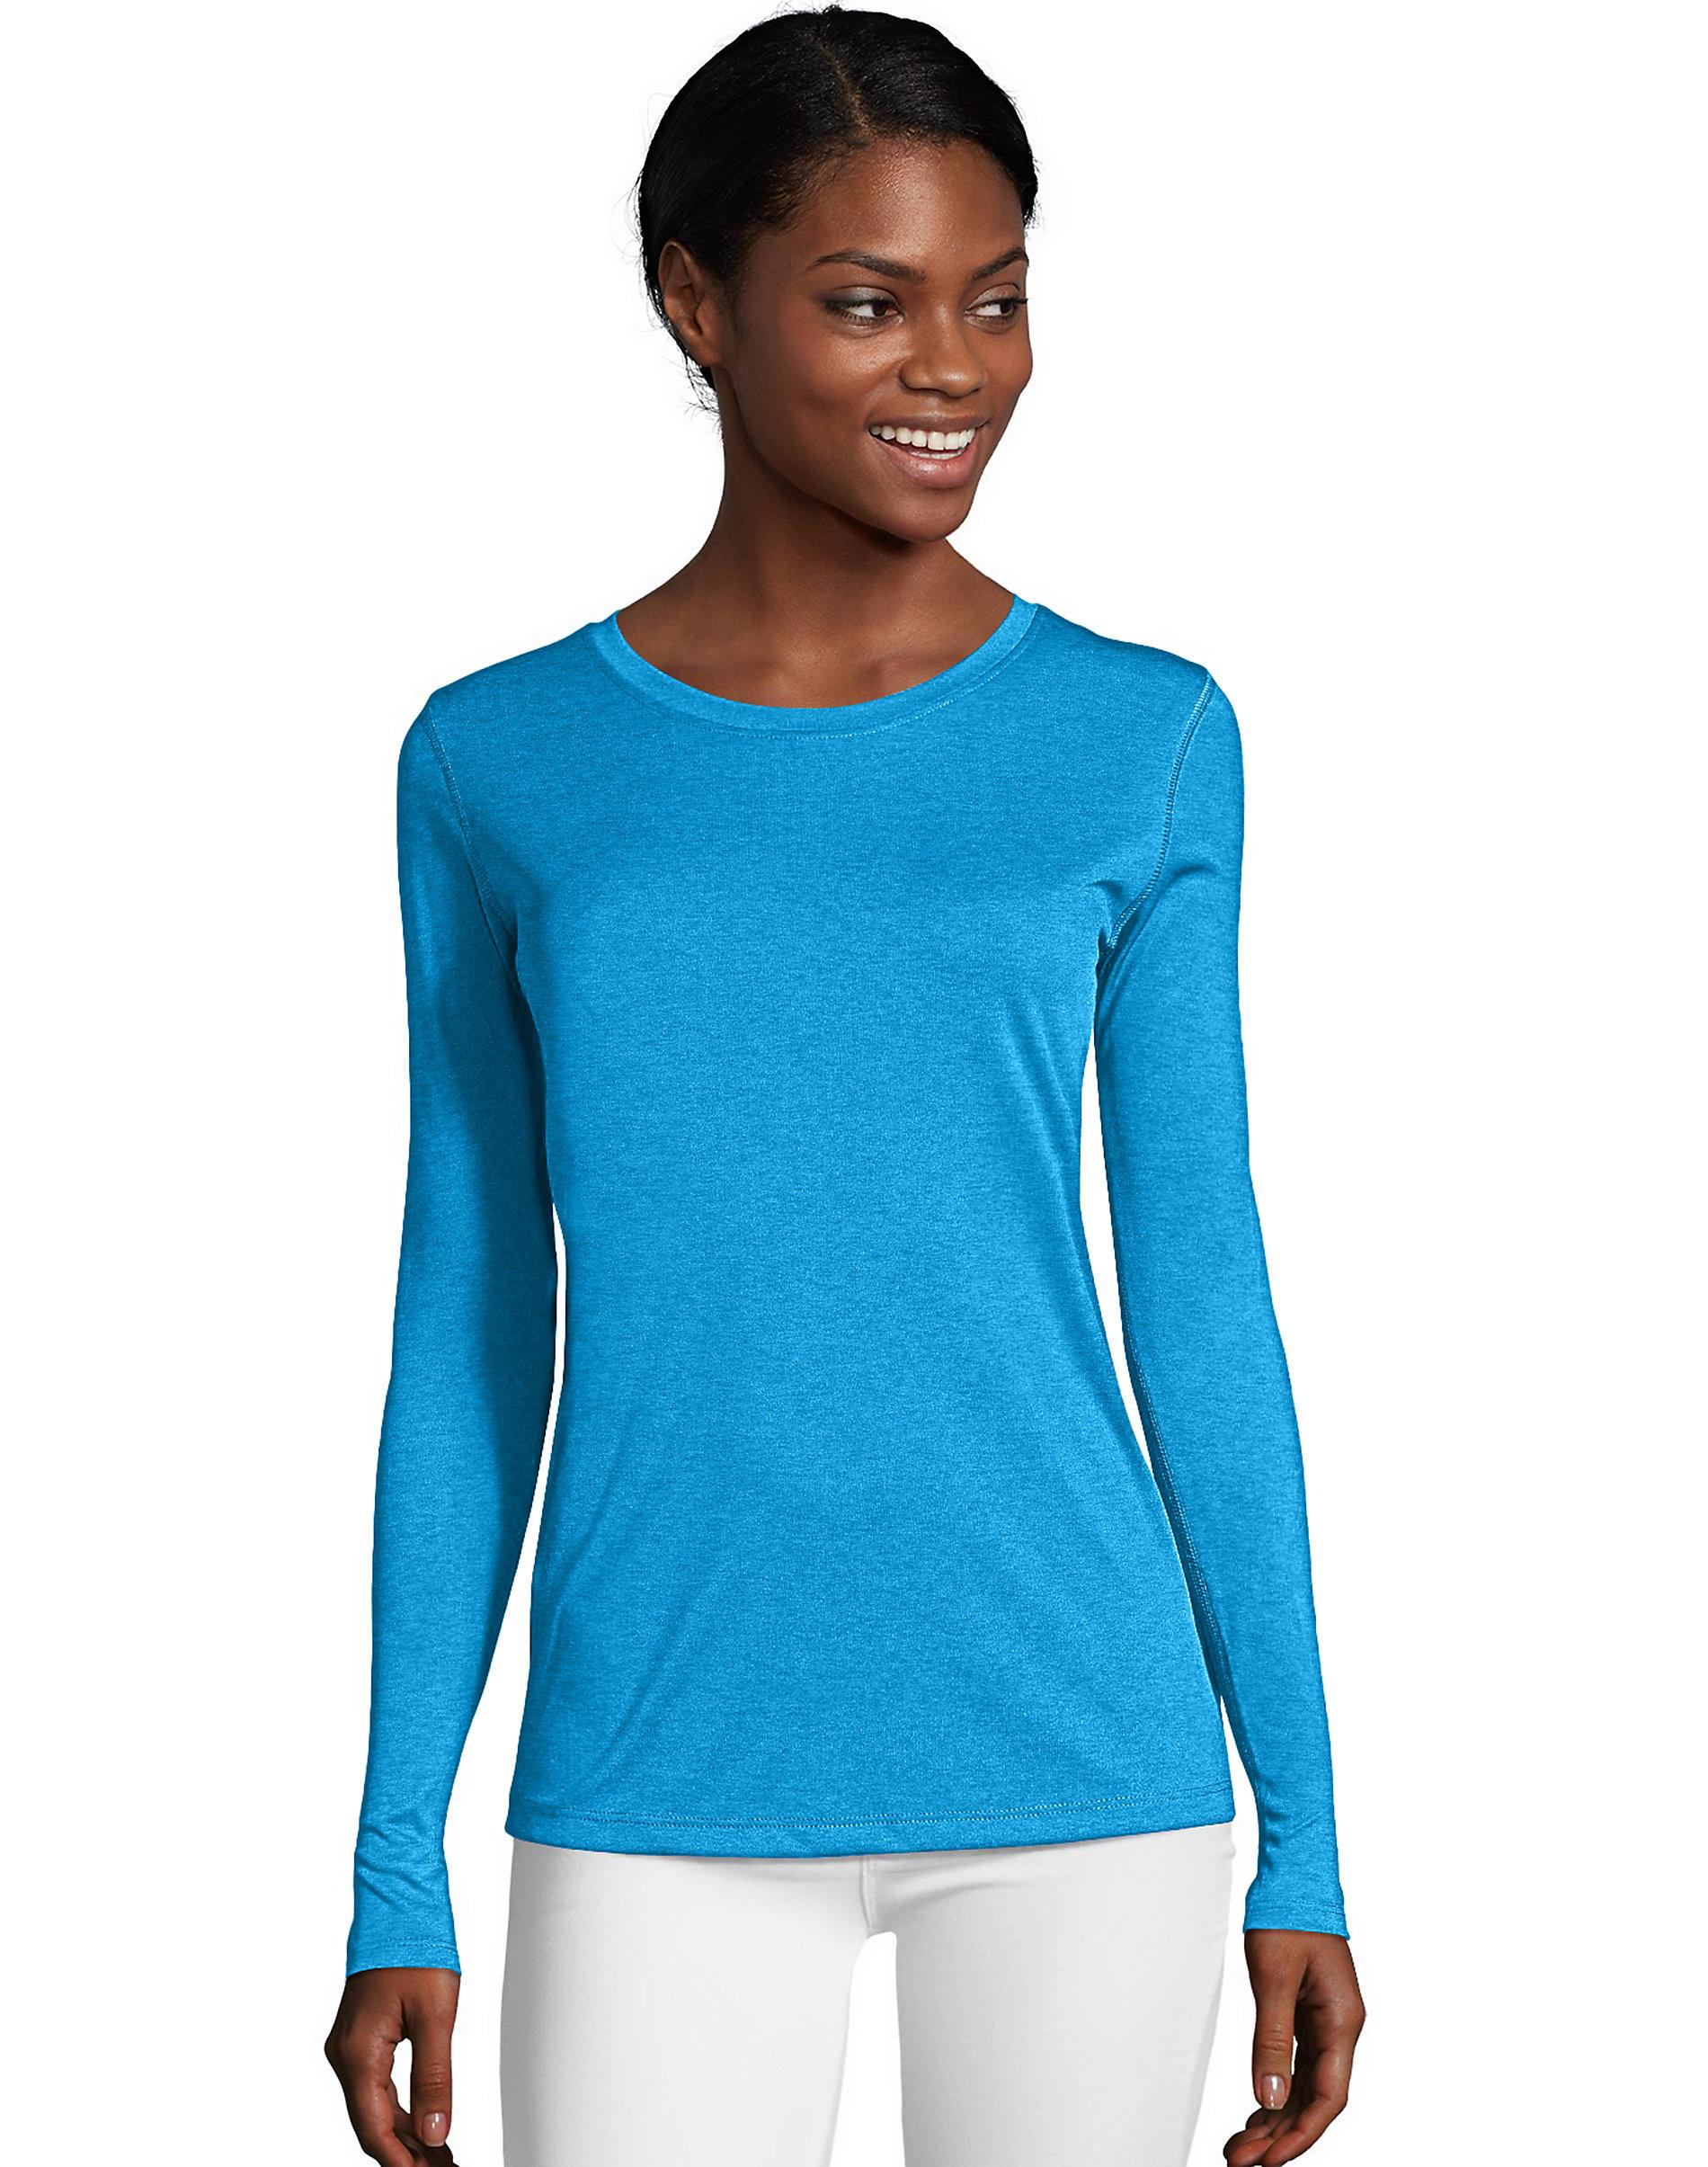 Hanes-Long-Sleeve-T-Shirt-Sport-Cool-DRI-Womens-Performance-Tee-Activewear-S-2XL thumbnail 7